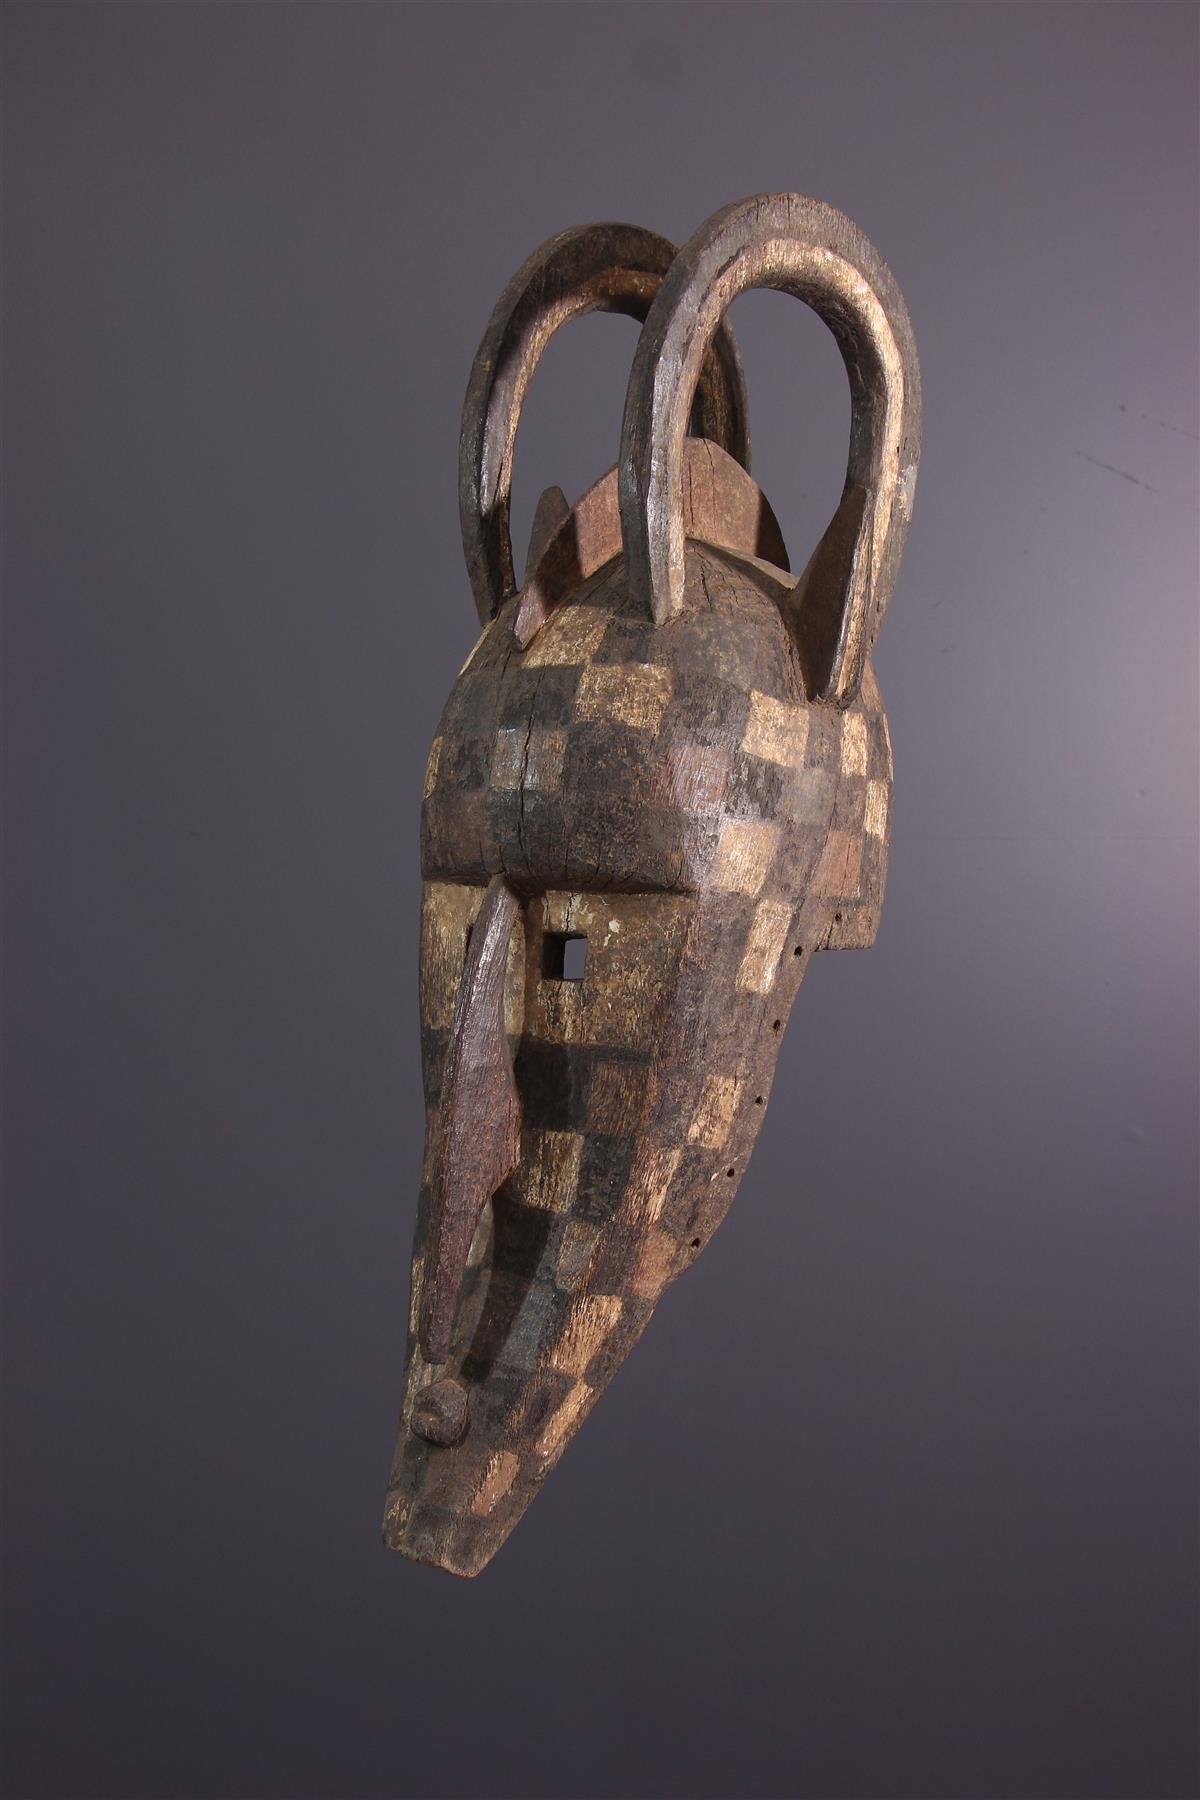 Bobo Mask - Tribal art